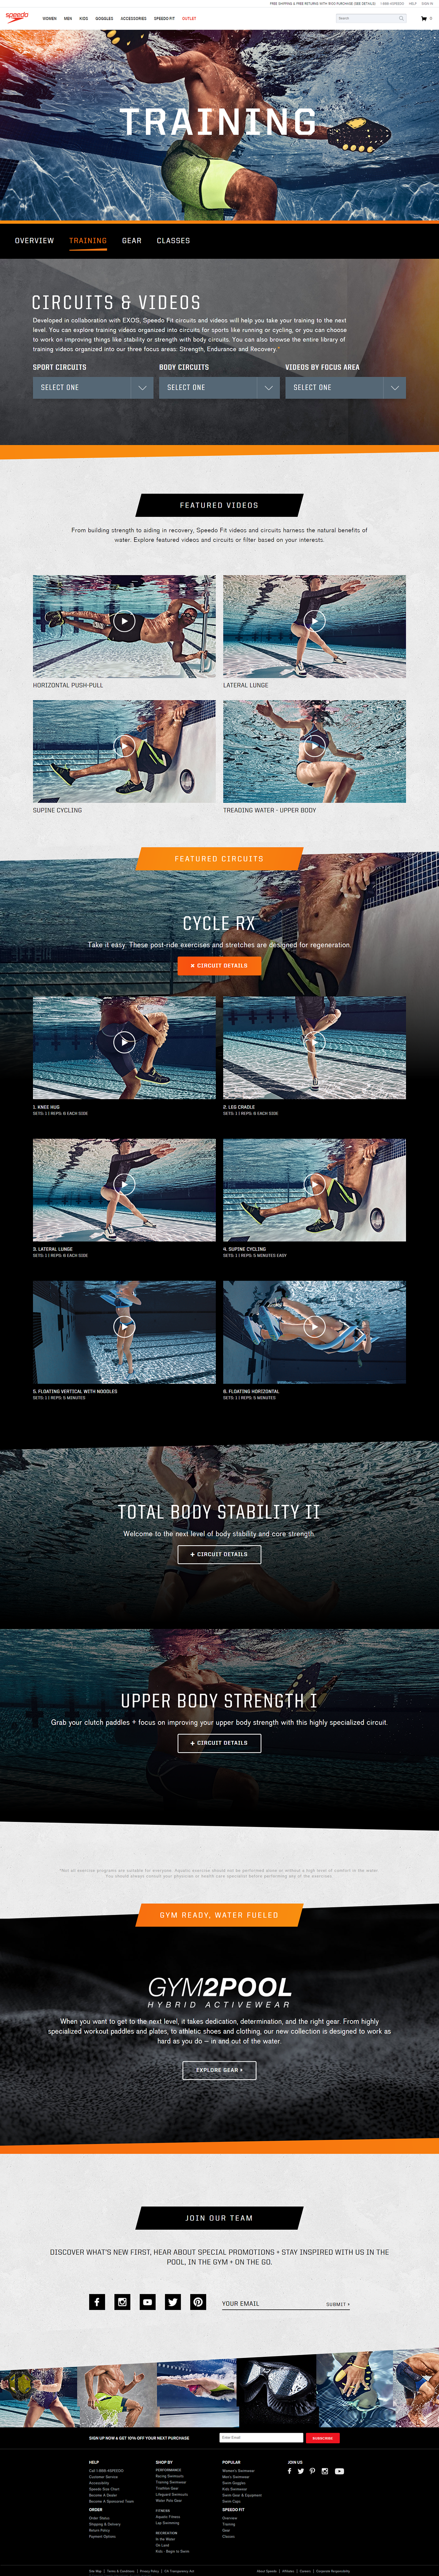 Speedo PVH Corp swimming fitness json